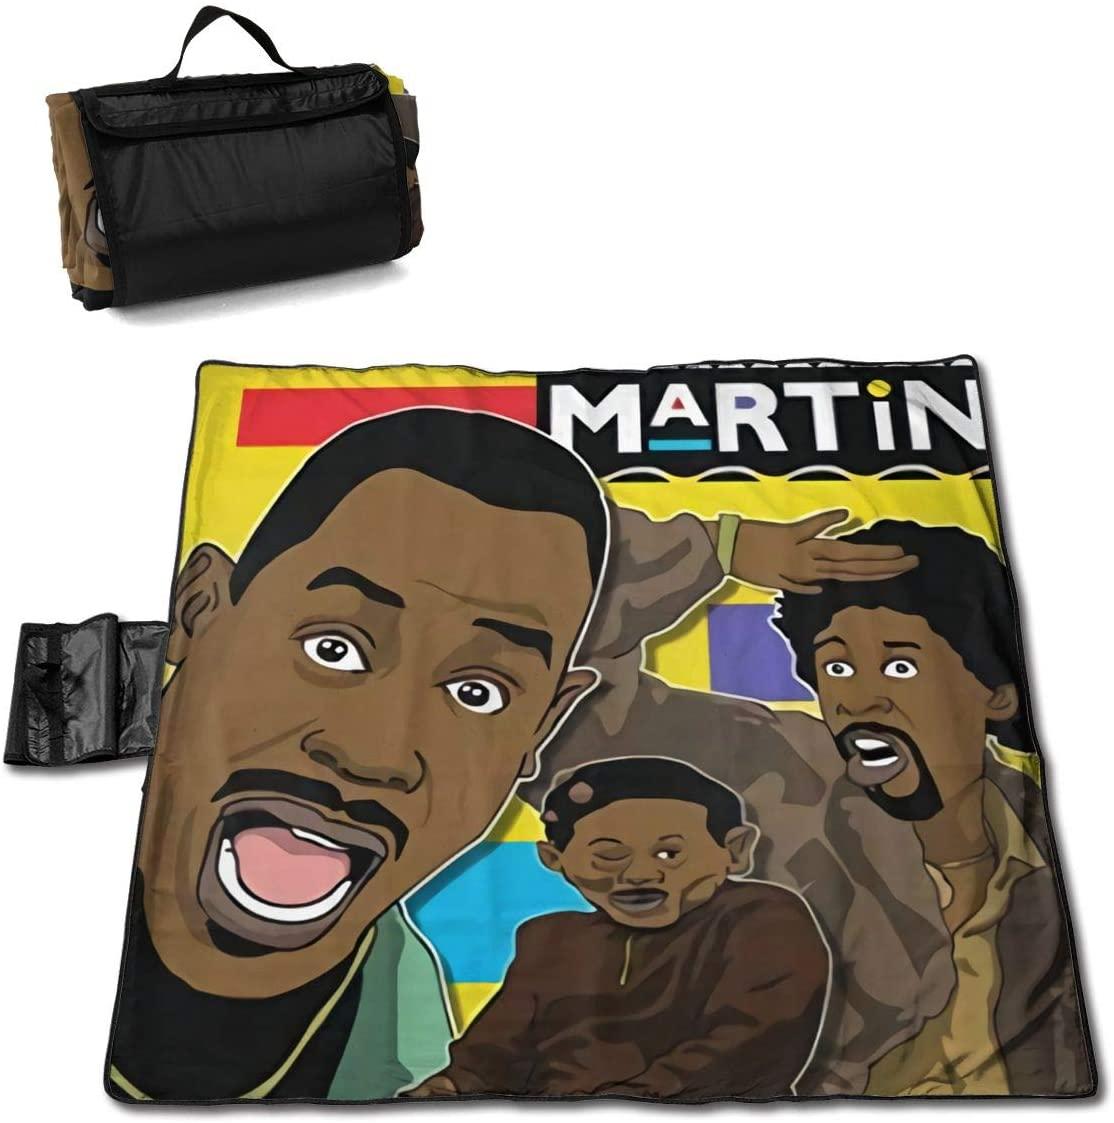 Fulu Cool Martin Lawrence Art Portable Printed Picnic Blanket Waterproof 59x57(in)